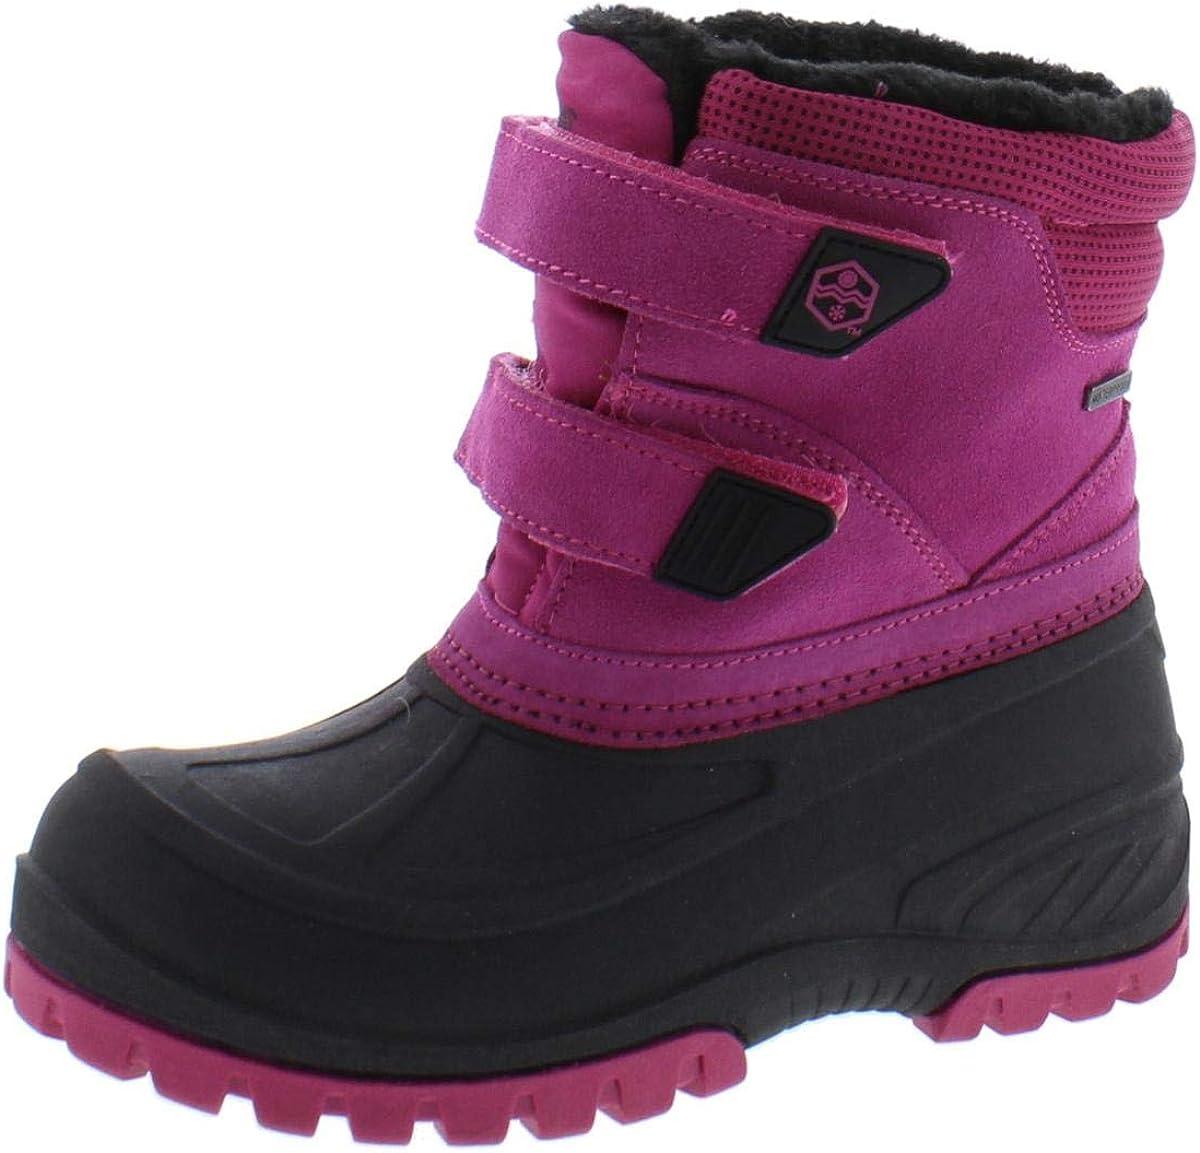 Khombu Girls Spirit Leather Snow Boots